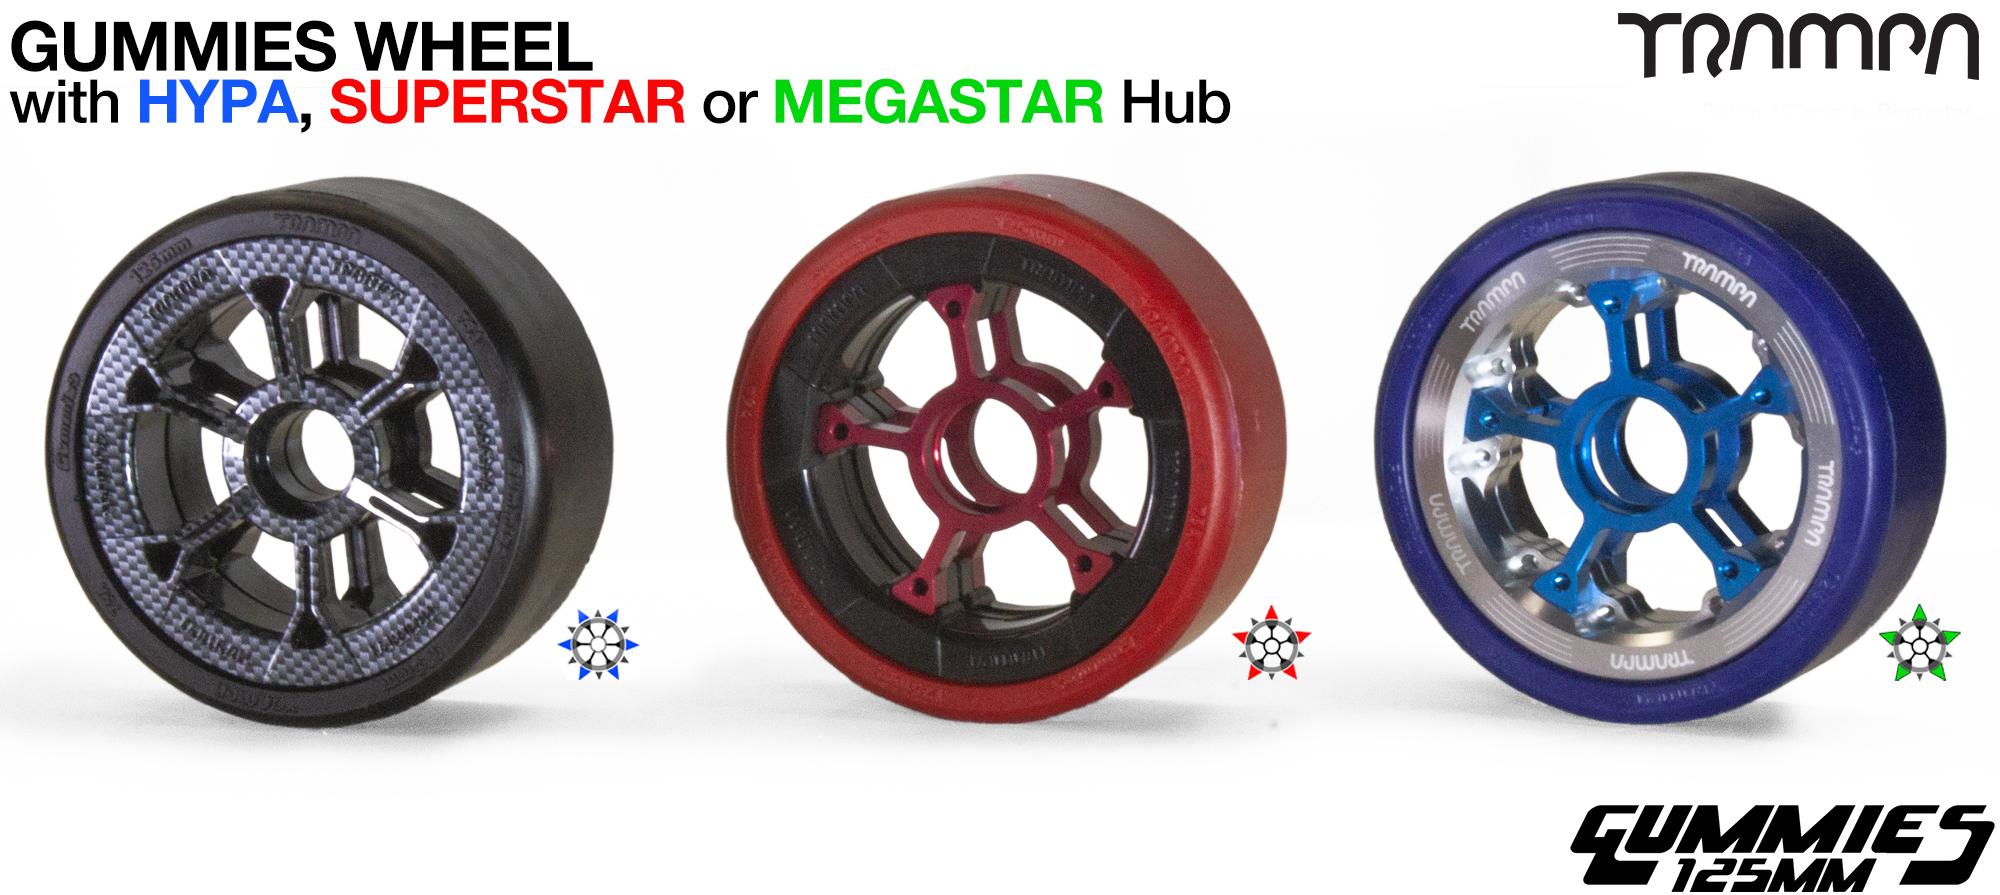 Custom TRAMPA hub with Gummies 125mm Longboard Wheel Tyre